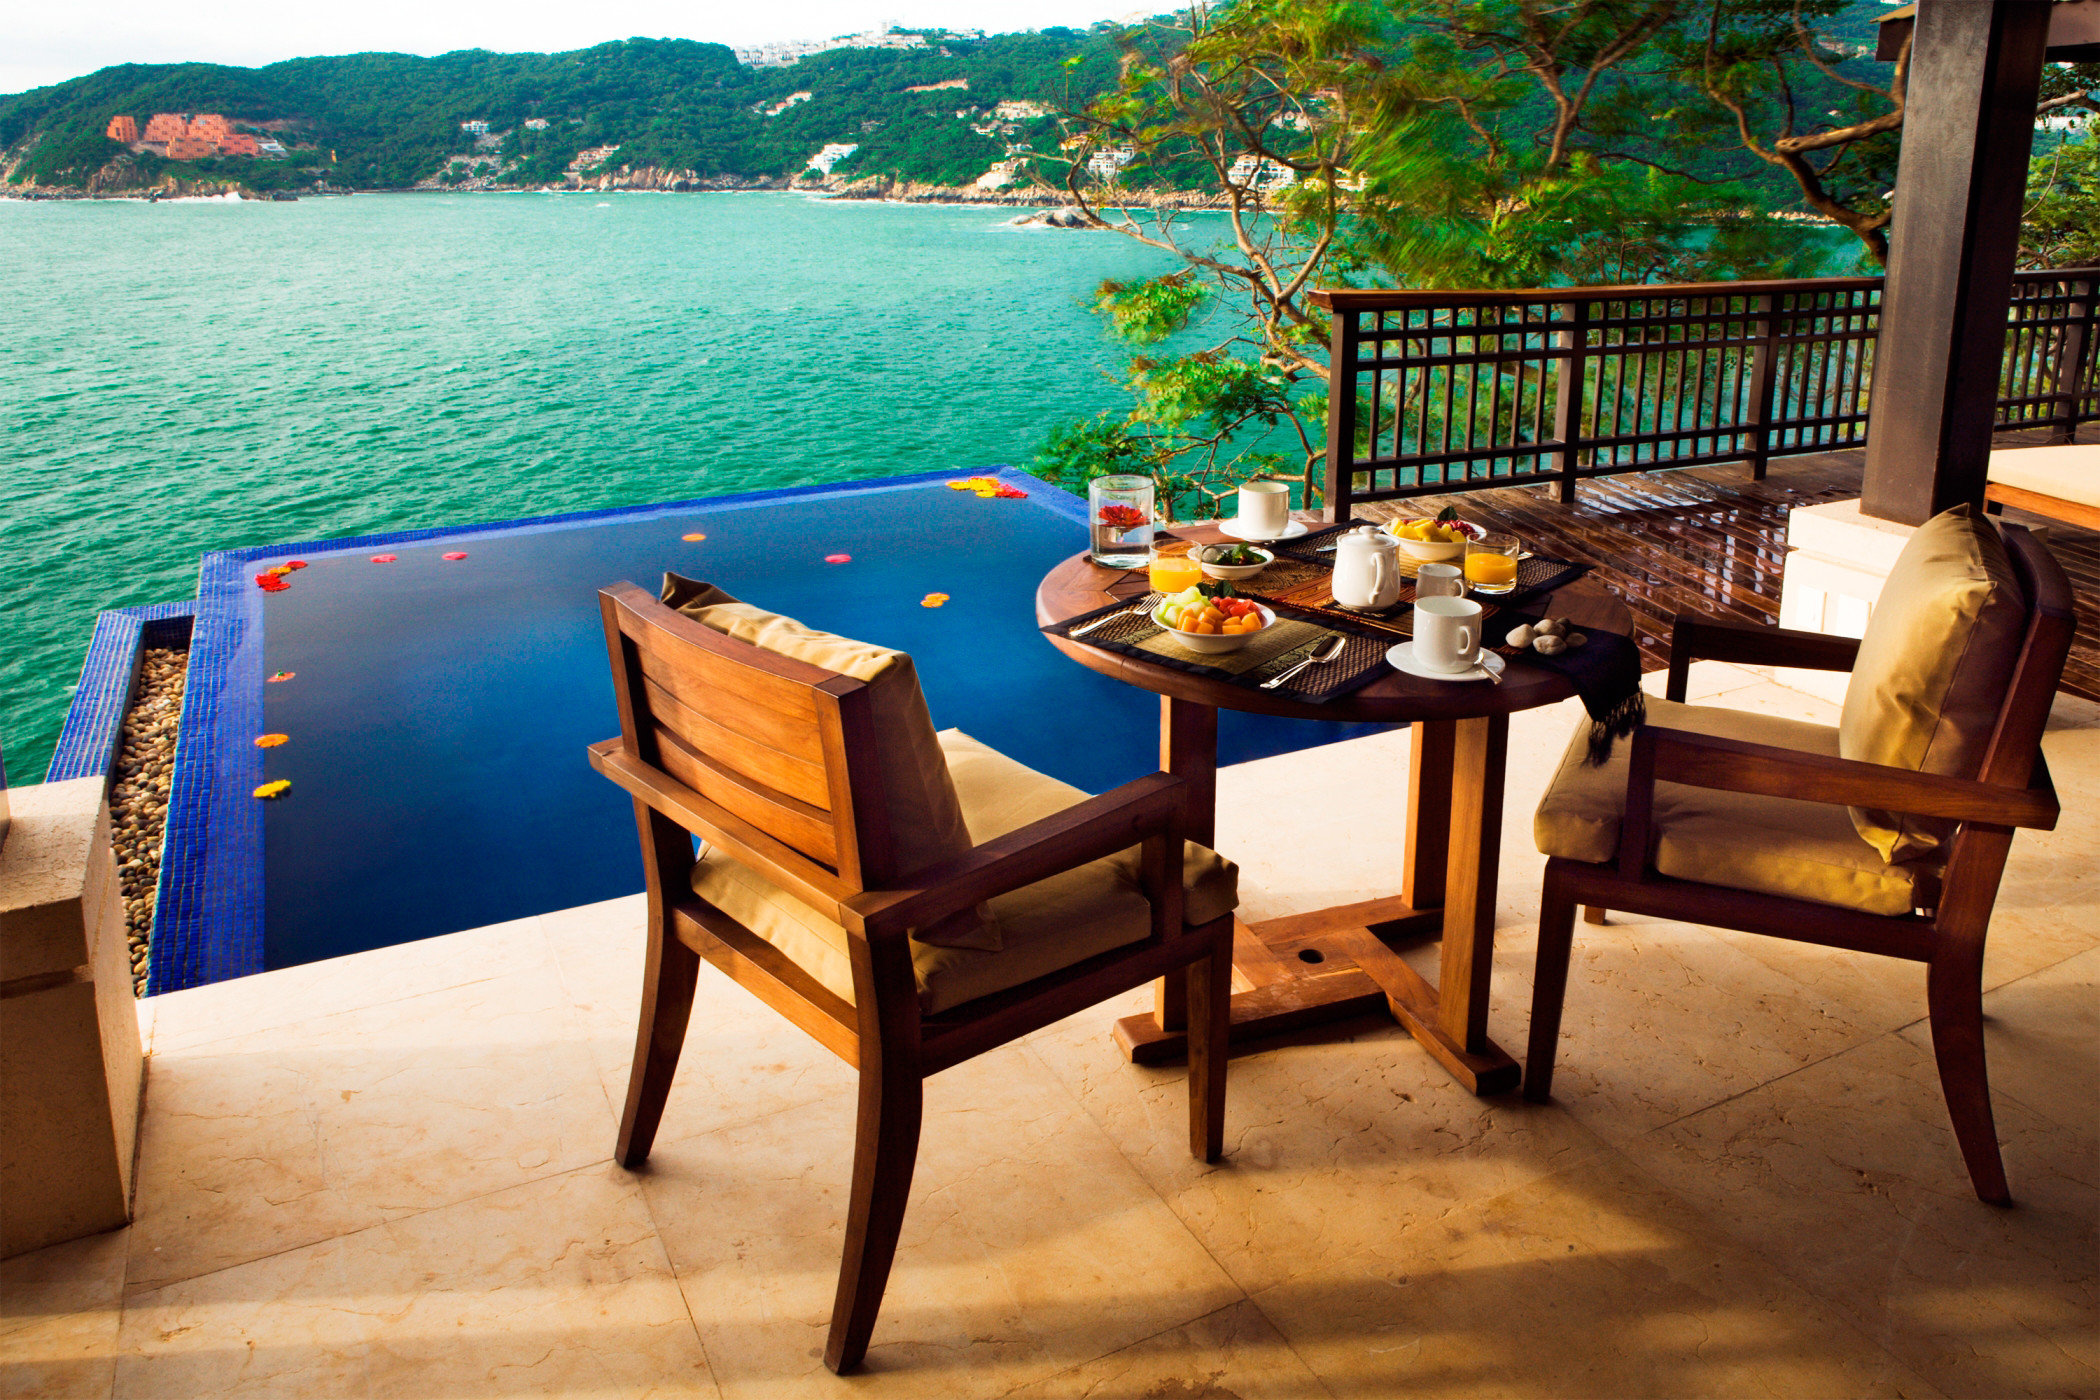 Deck Lounge Luxury Pool Romantic water leisure property home Villa Resort cottage overlooking Island